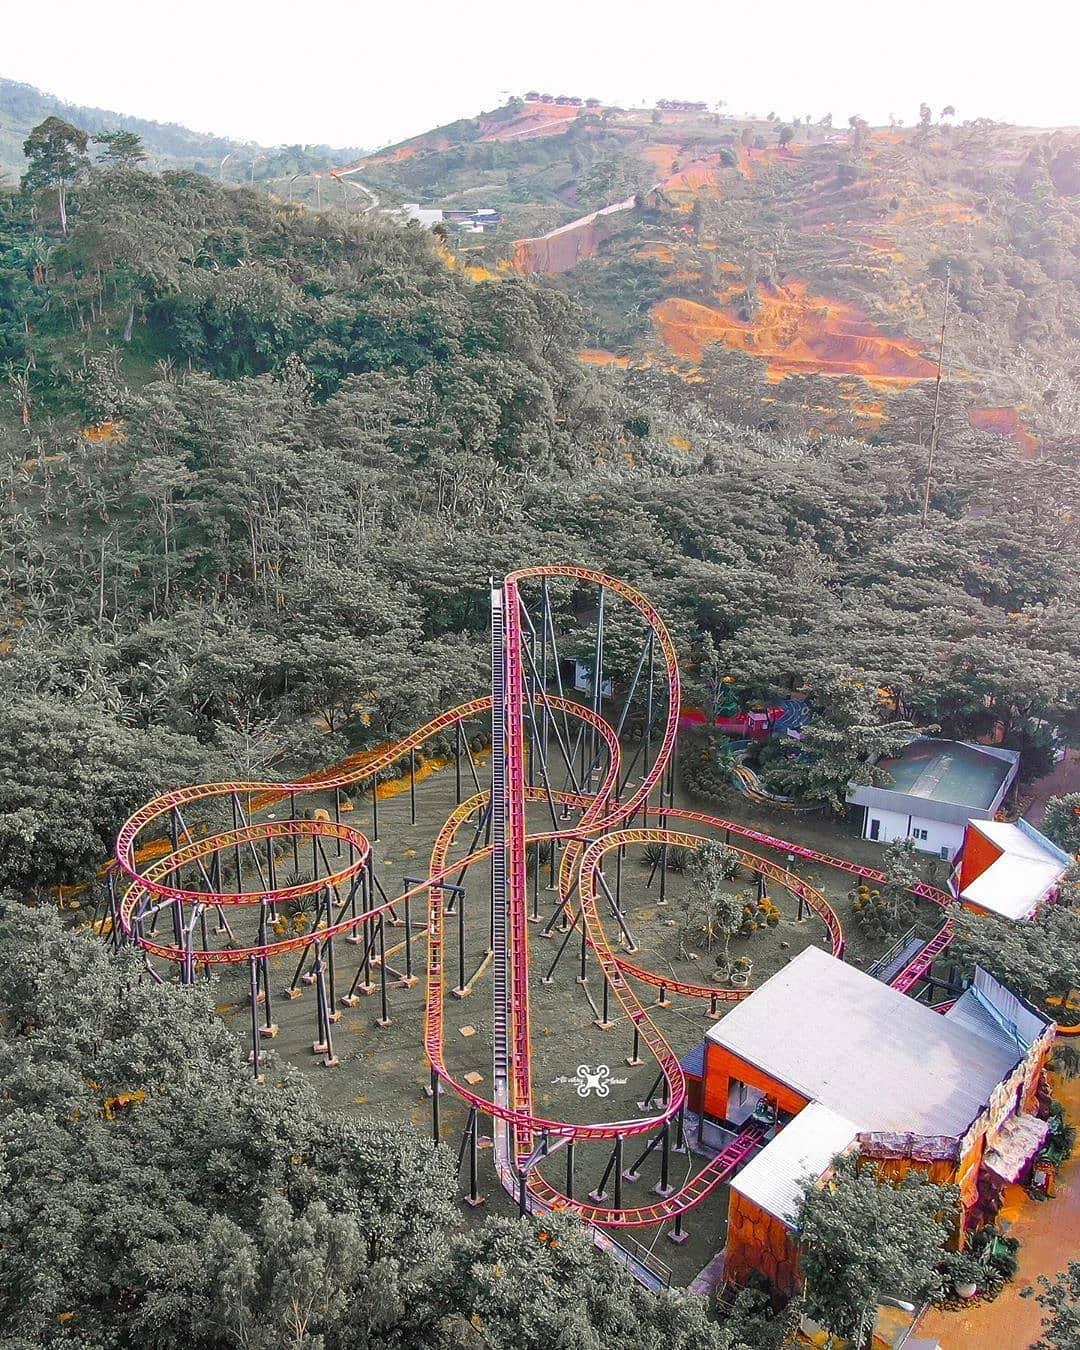 Tiket Jungleland